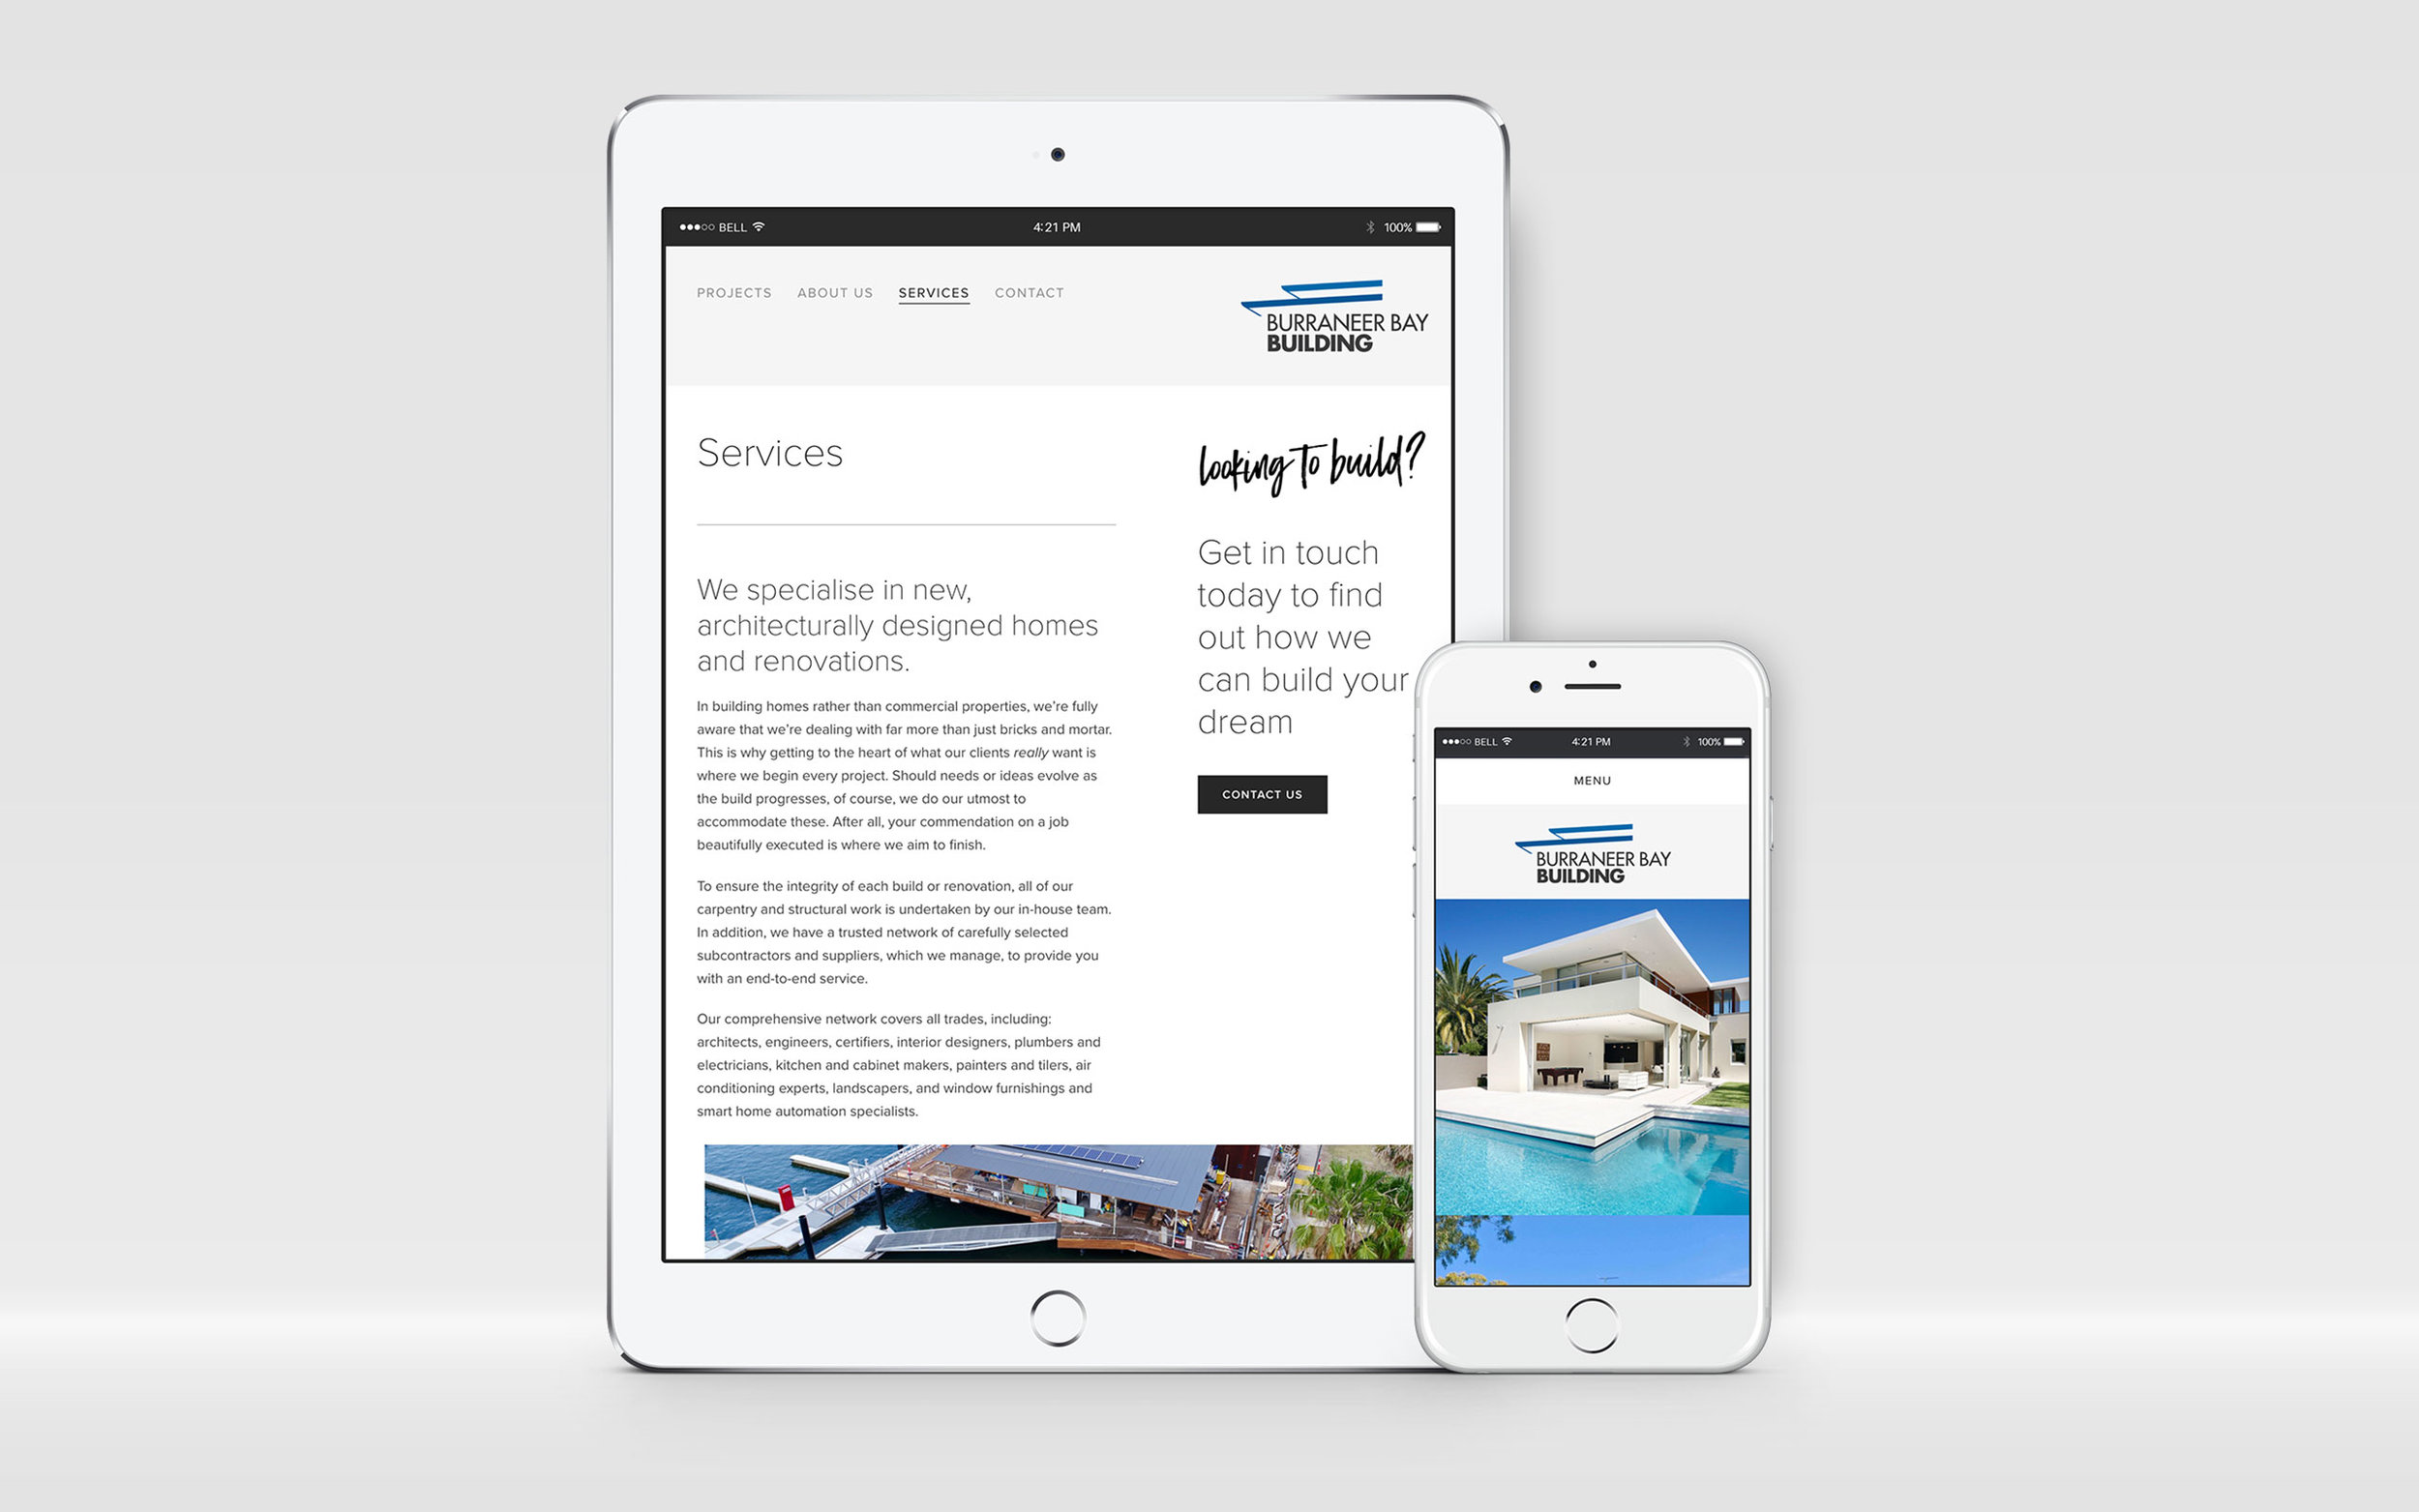 Burraneer-Bay-Building-Website-Copywriting-3.jpg